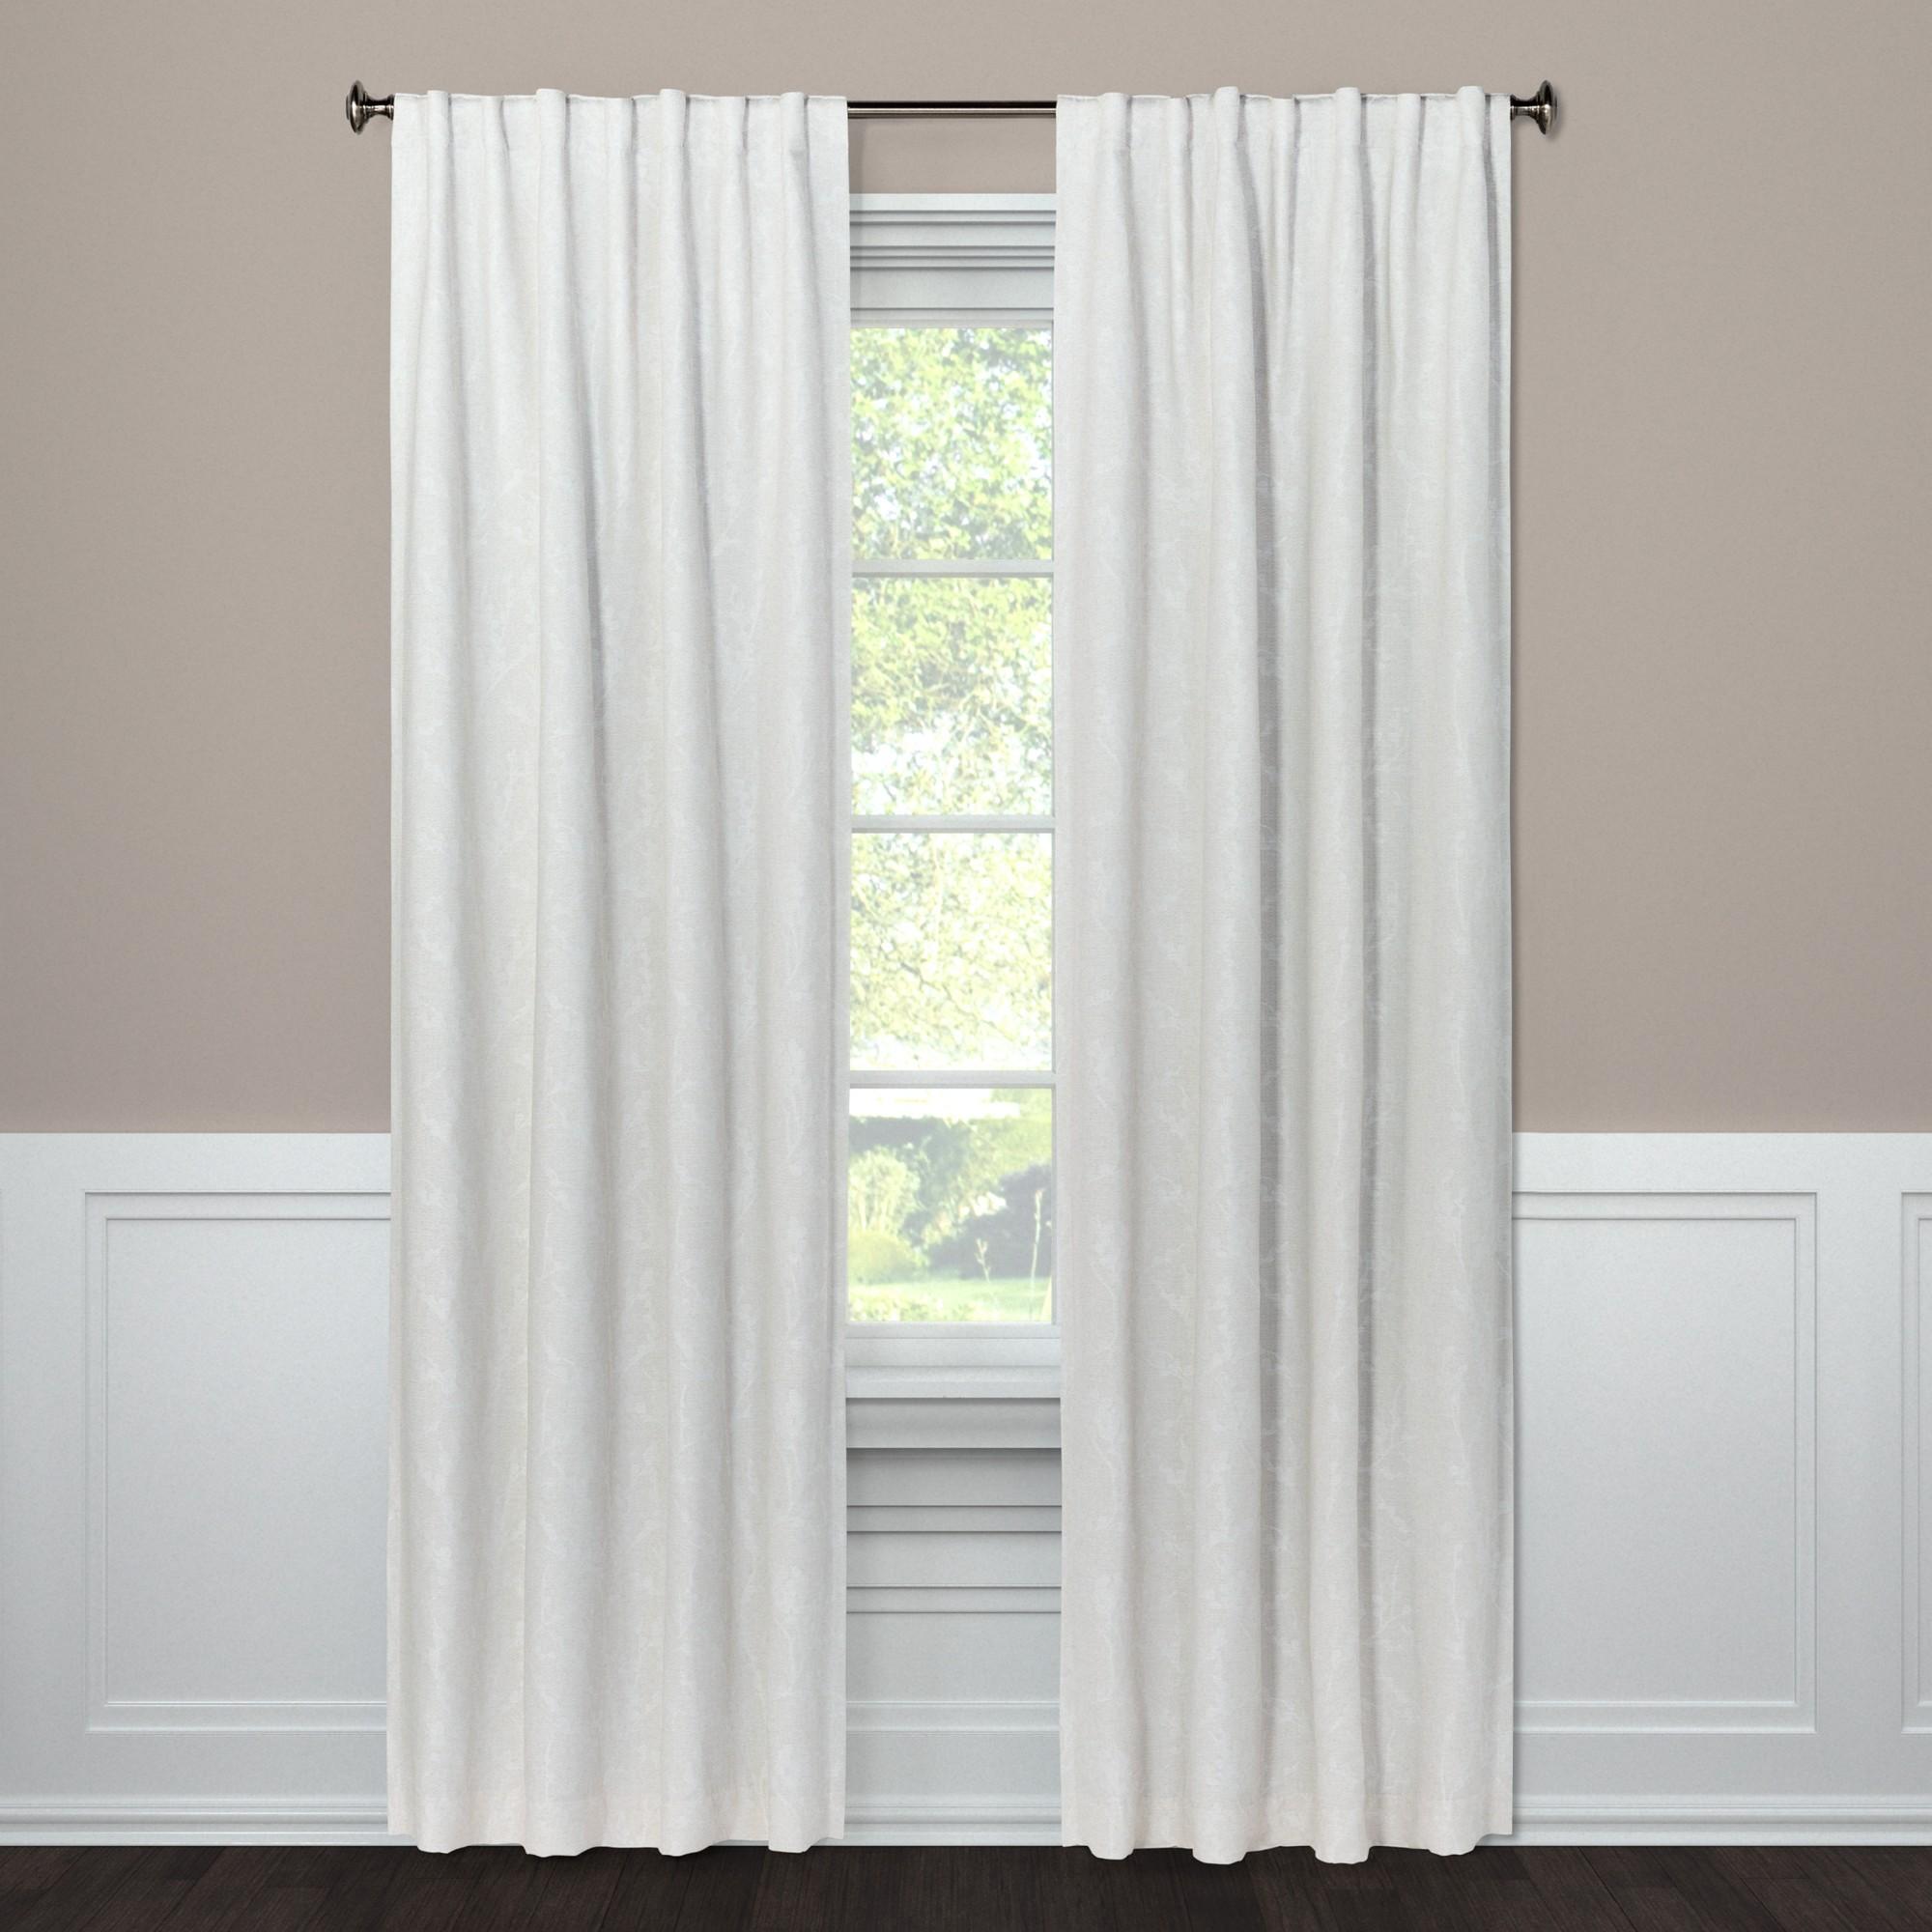 Blackout Curtain Panel Edalene Almond Cream 108 Threshold